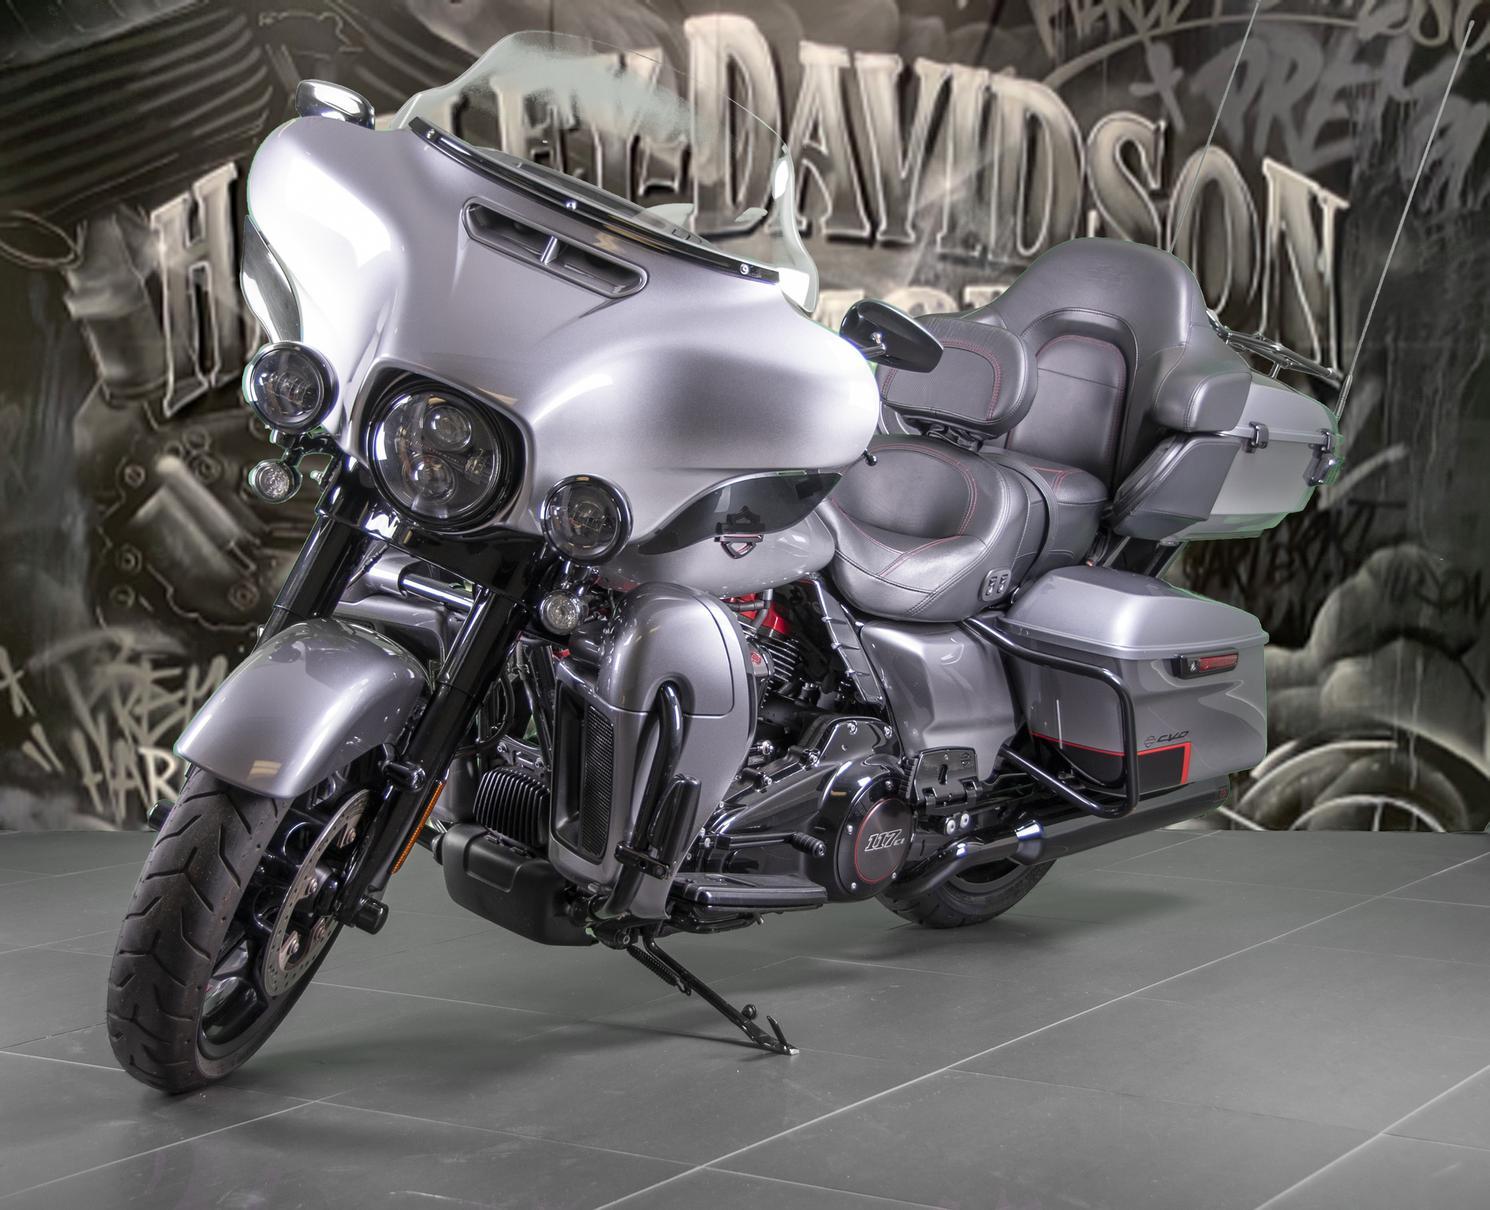 2019 Harley-Davidson FLHRXS Road King Special